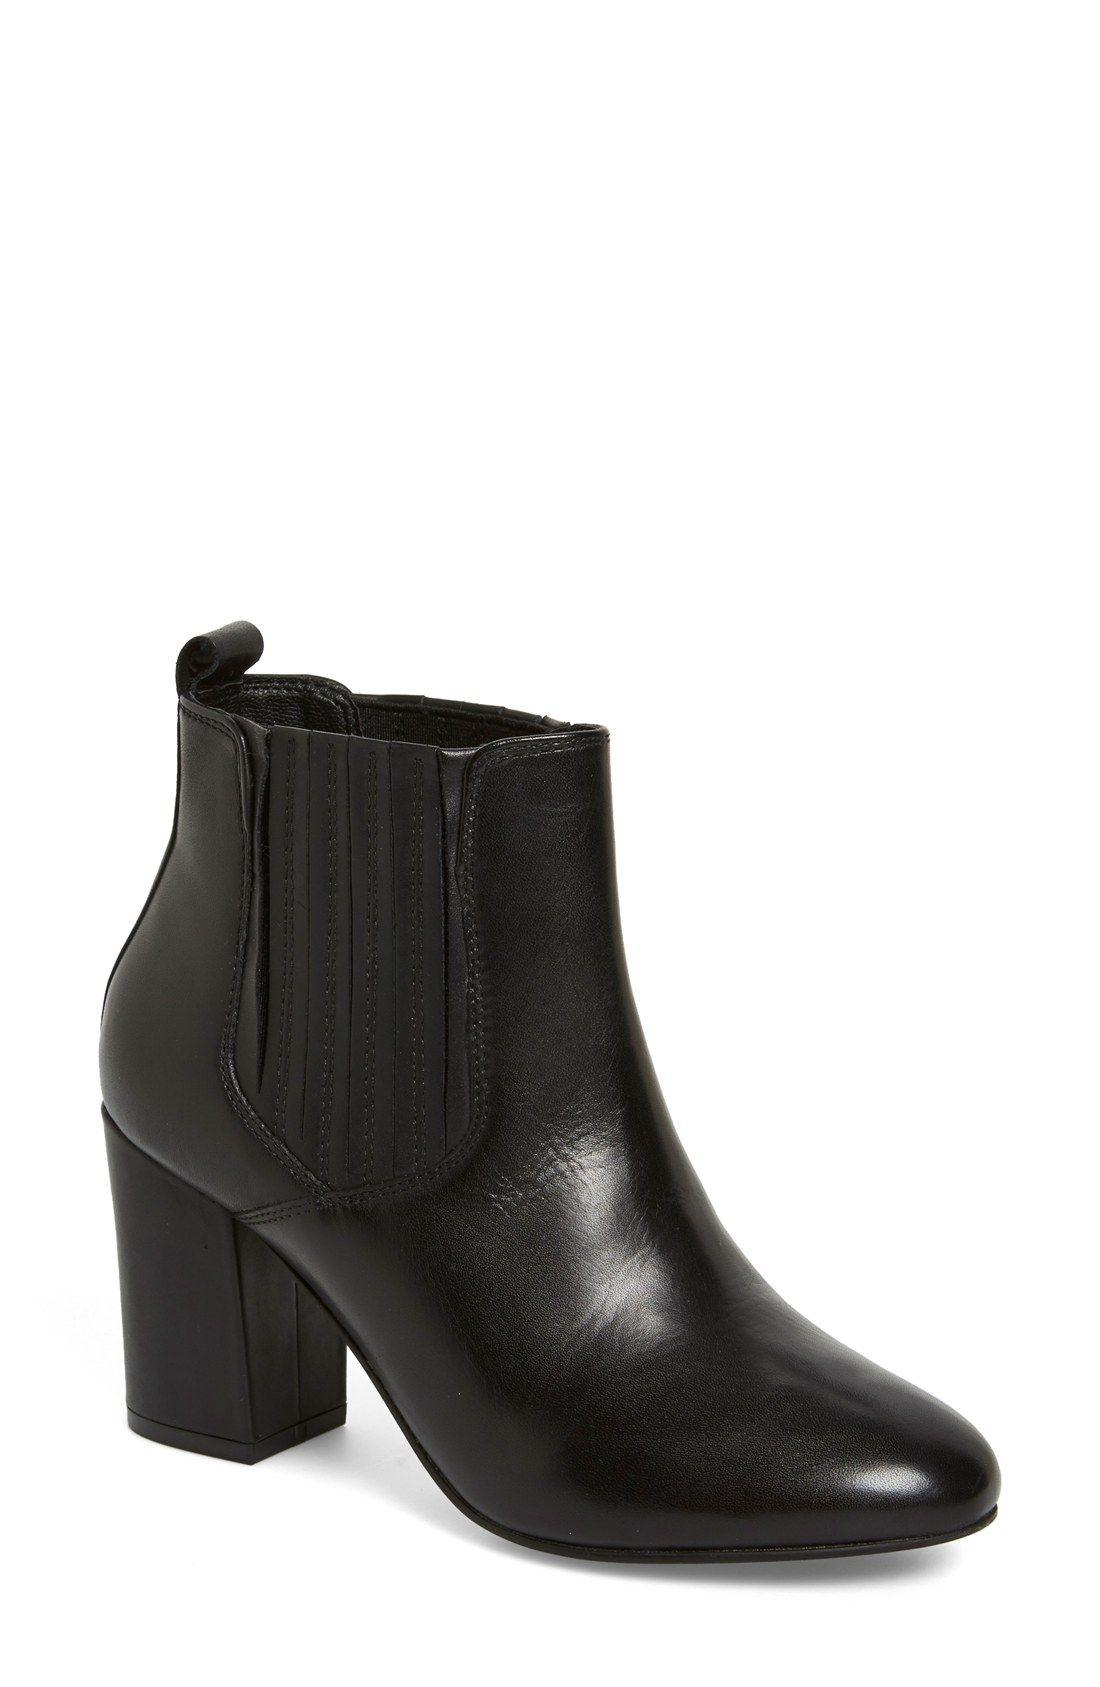 af90e8baa65 Steve Madden 'Gasto' Bootie (Women) | shooz | Trendy clothes for ...